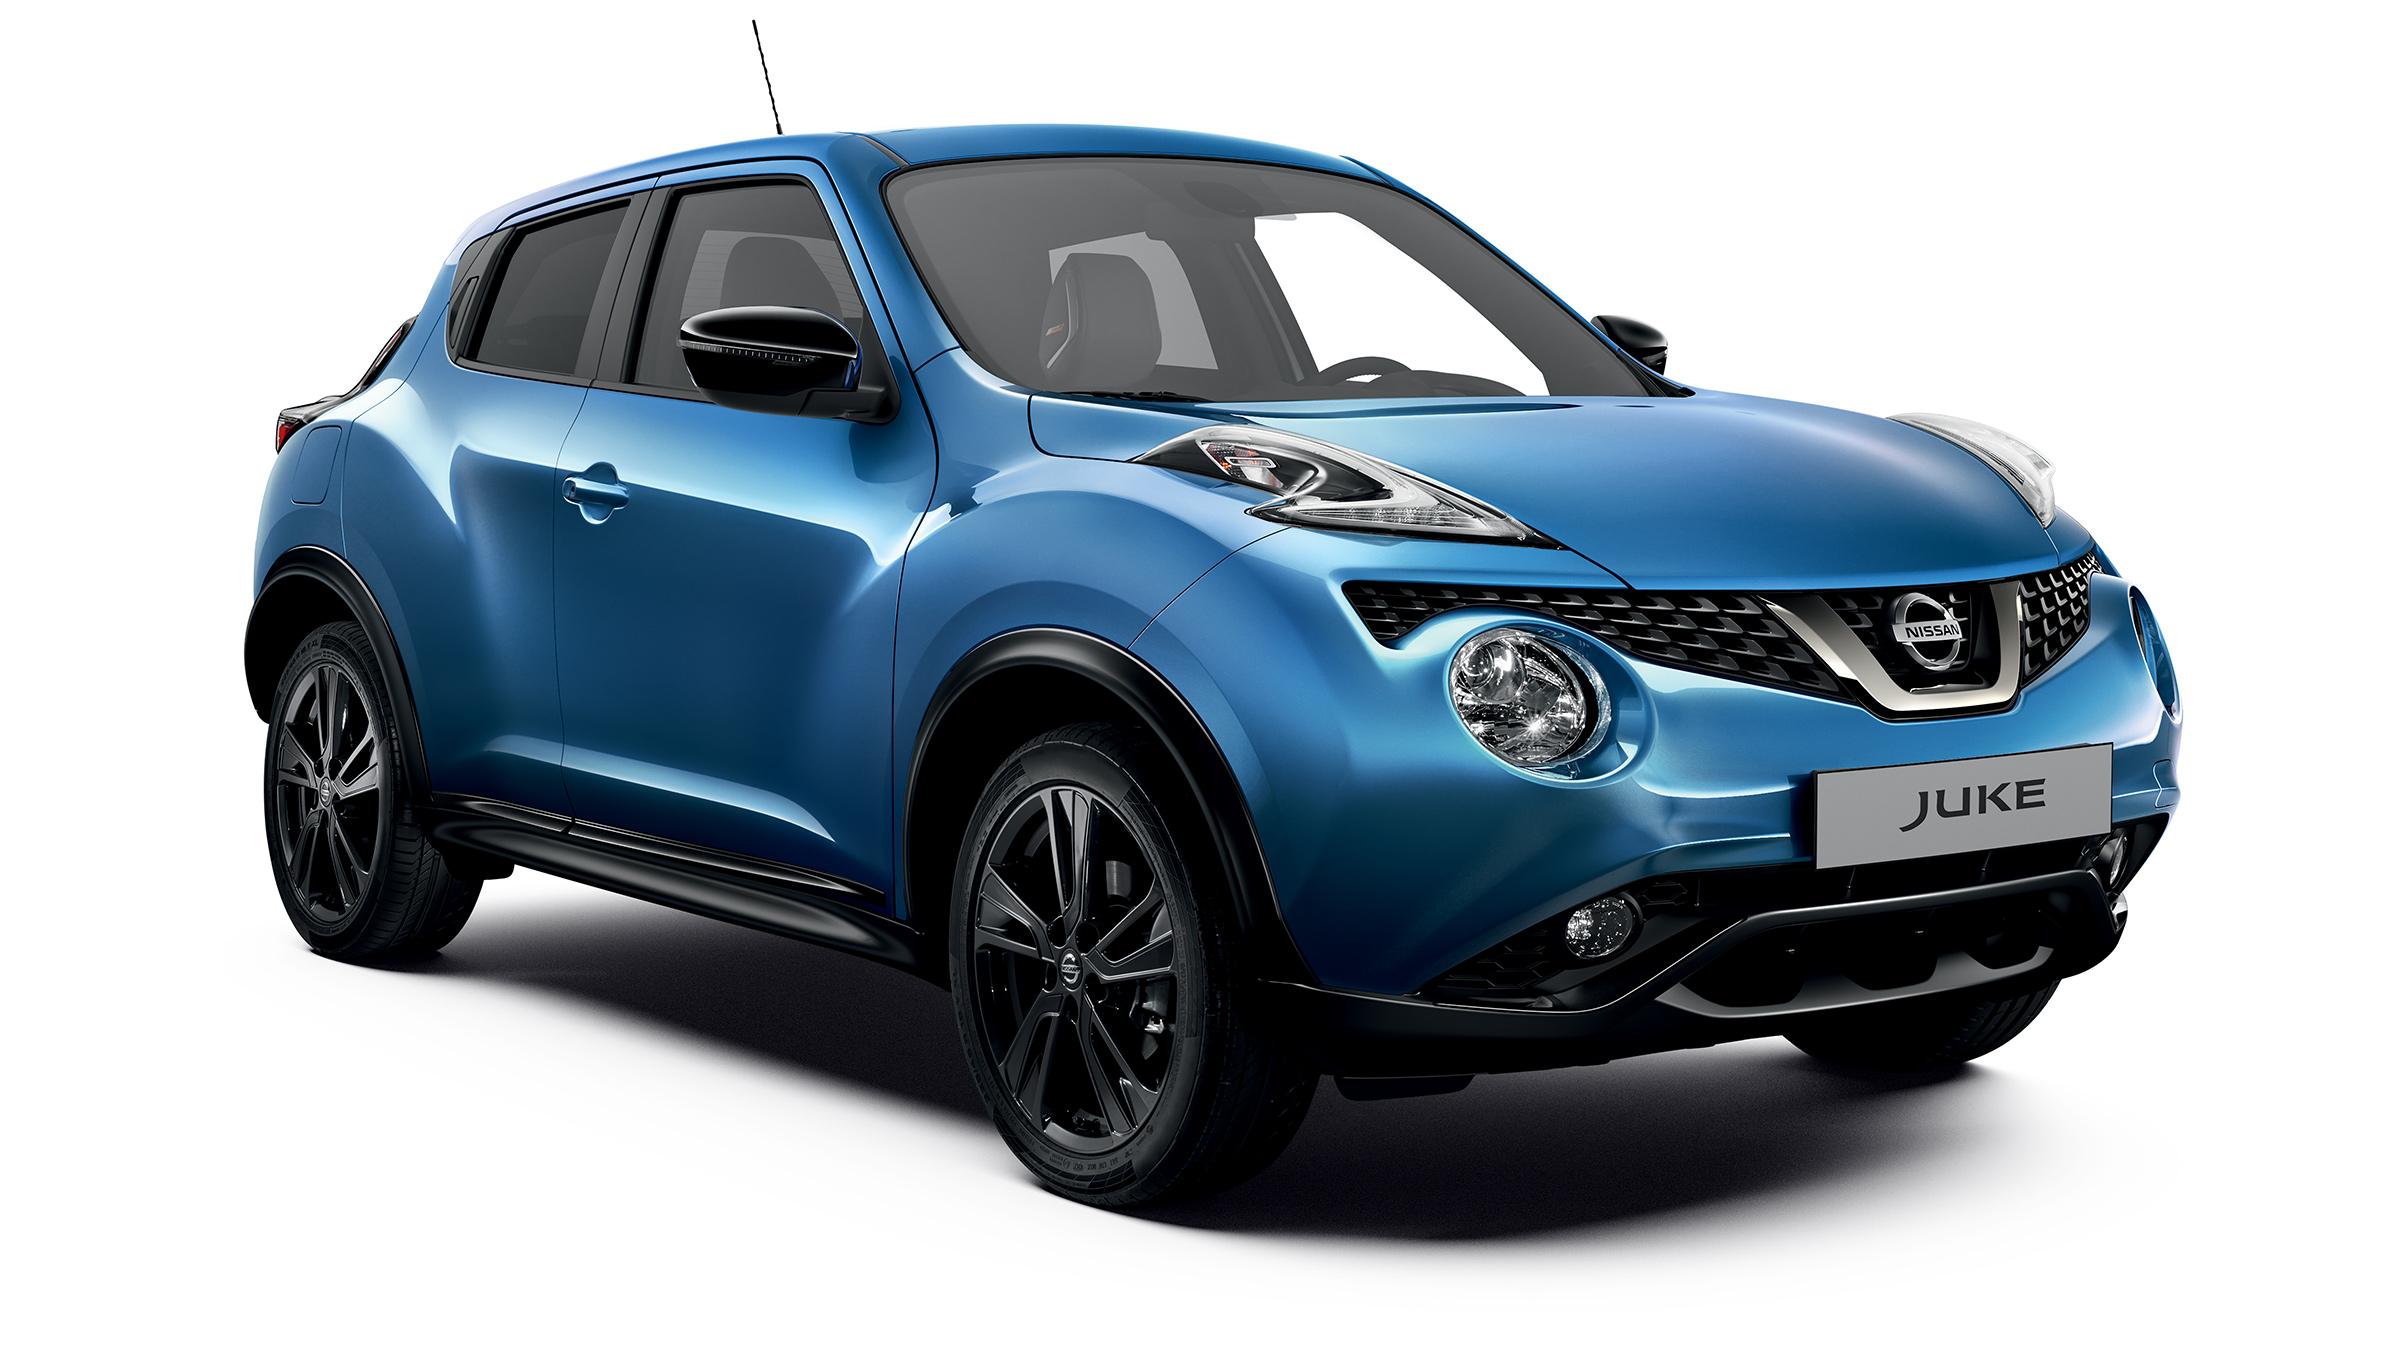 Imagem do Nissan JUKE 2018